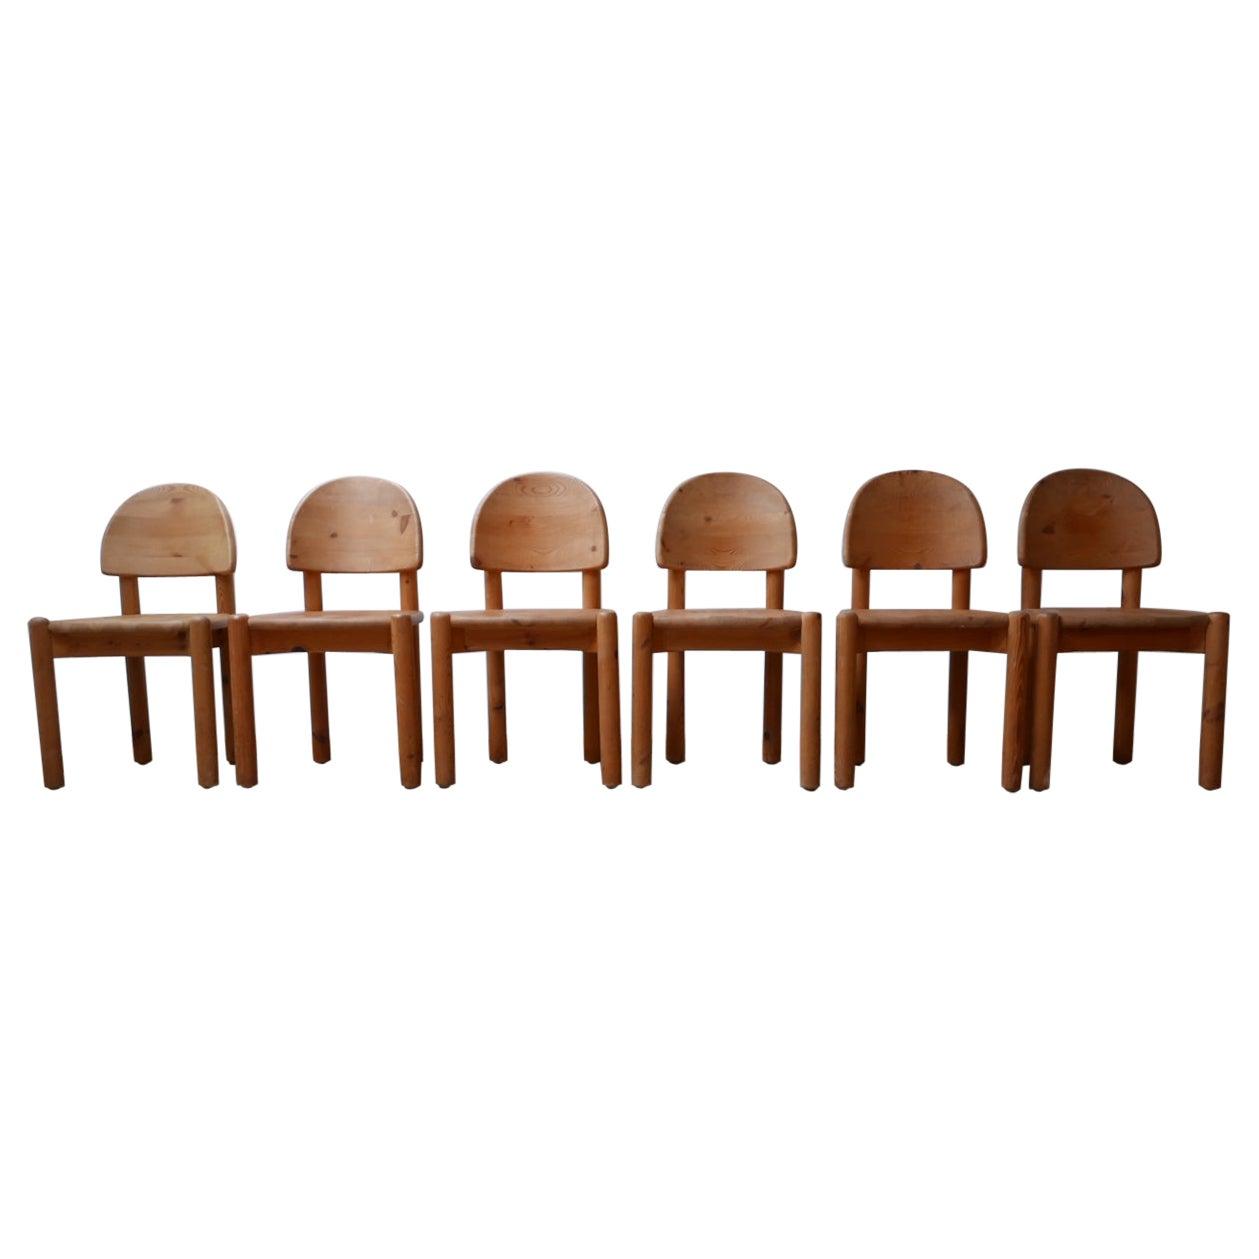 Rainer Daumiller Midcentury Pine Dining Chairs '6'